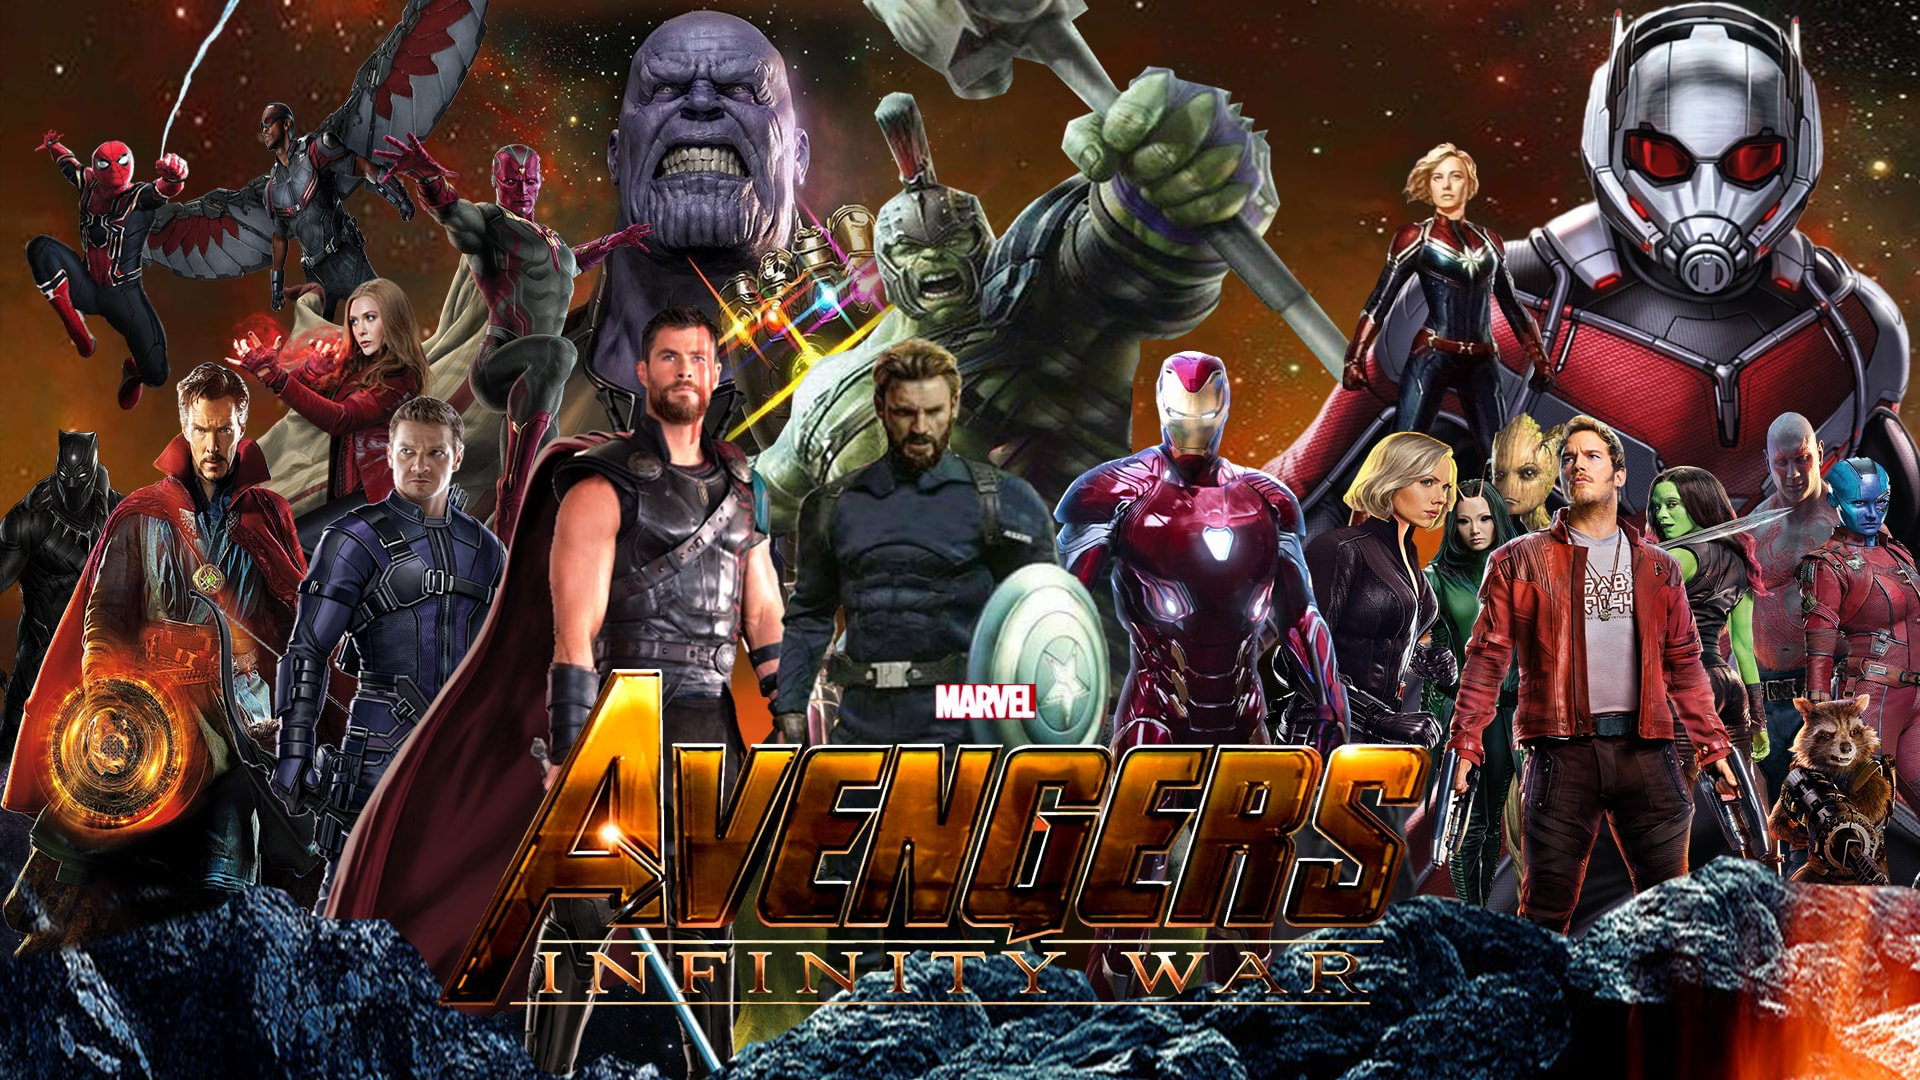 Avengers Infinity War Hd Wallpapers 7wallpapersnet